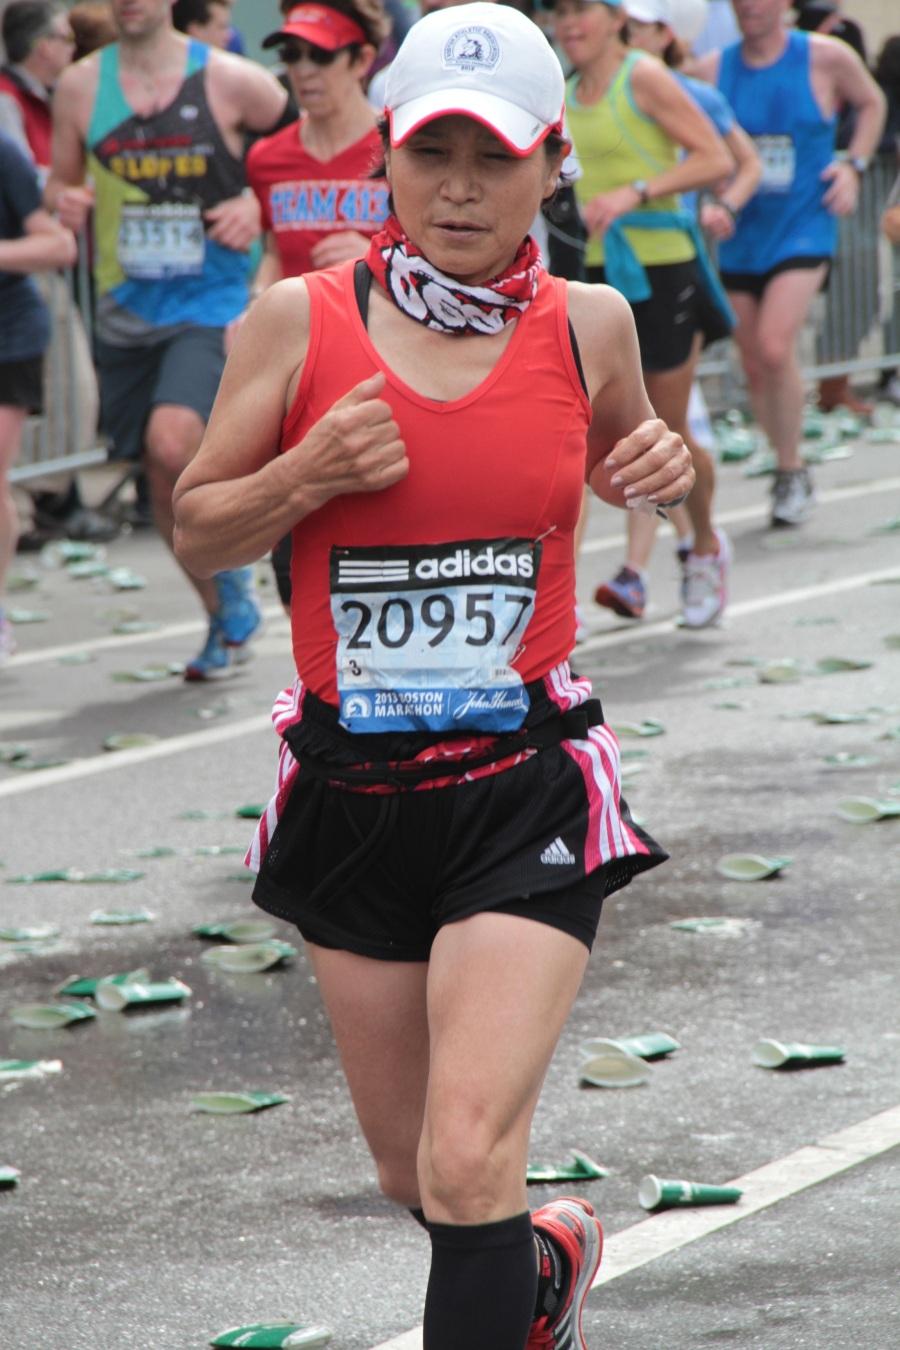 boston marathon 2013 8